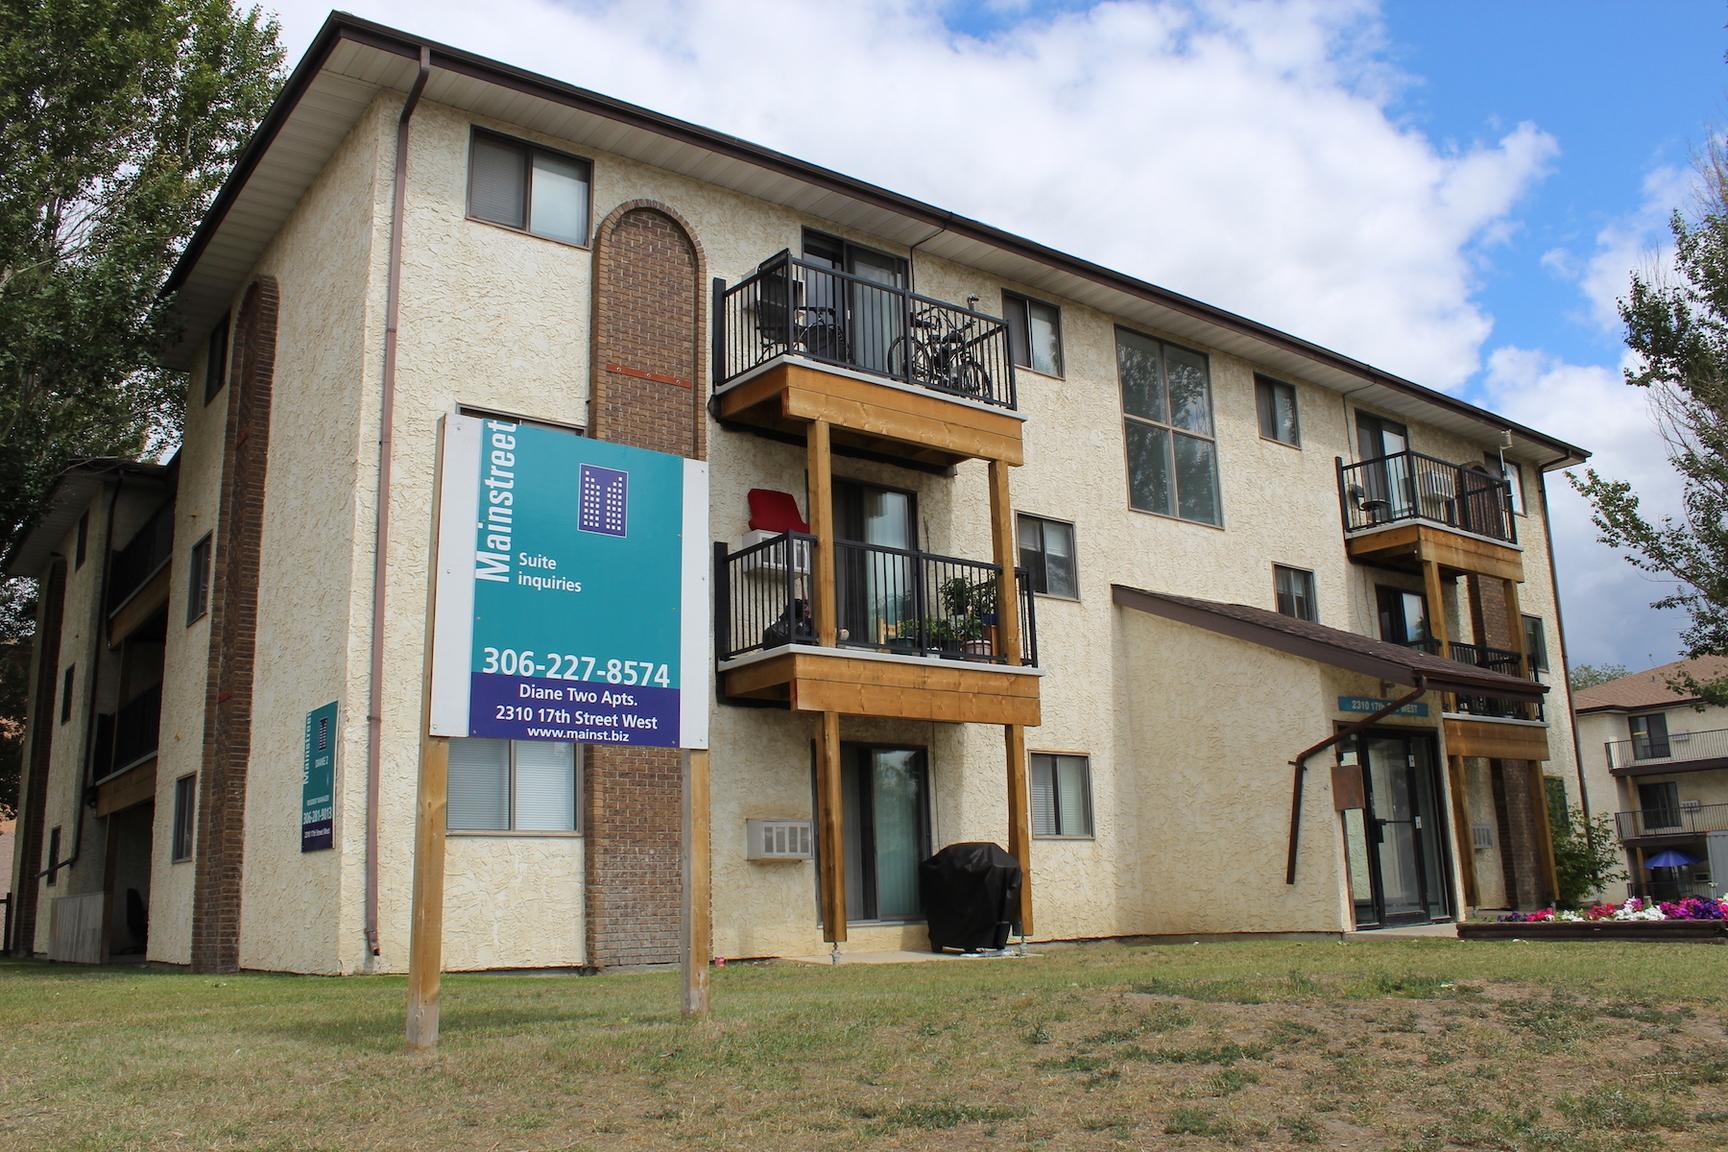 2310 17 Street West, Saskatoon, SK - 675 CAD/ month